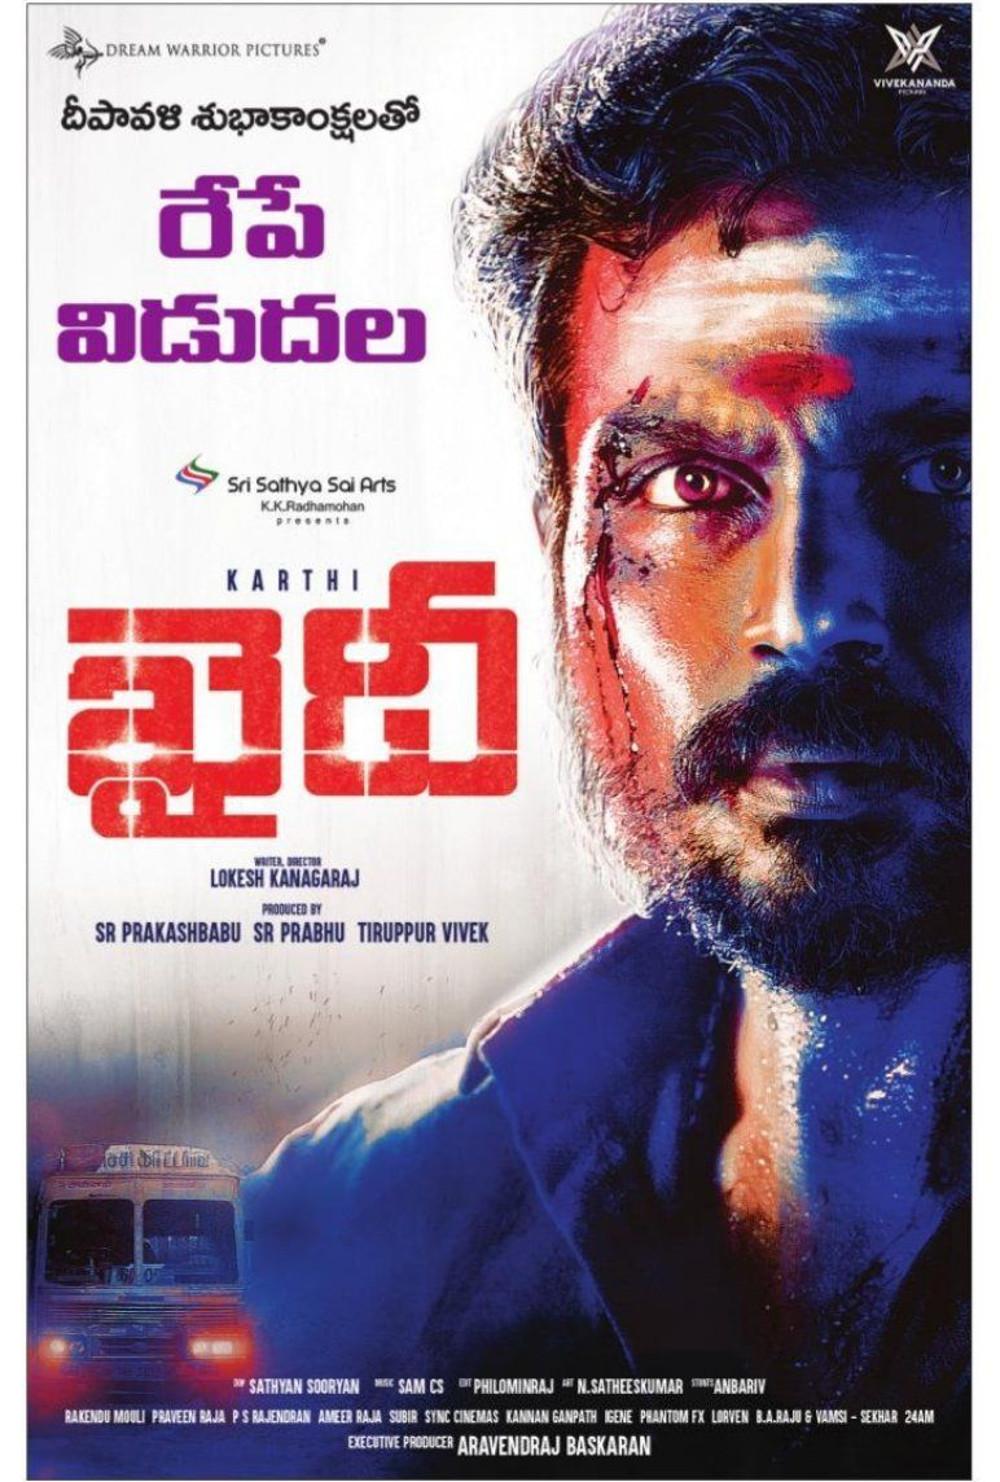 Karthi Khaidi Movie Releasing Tomorrow Posters